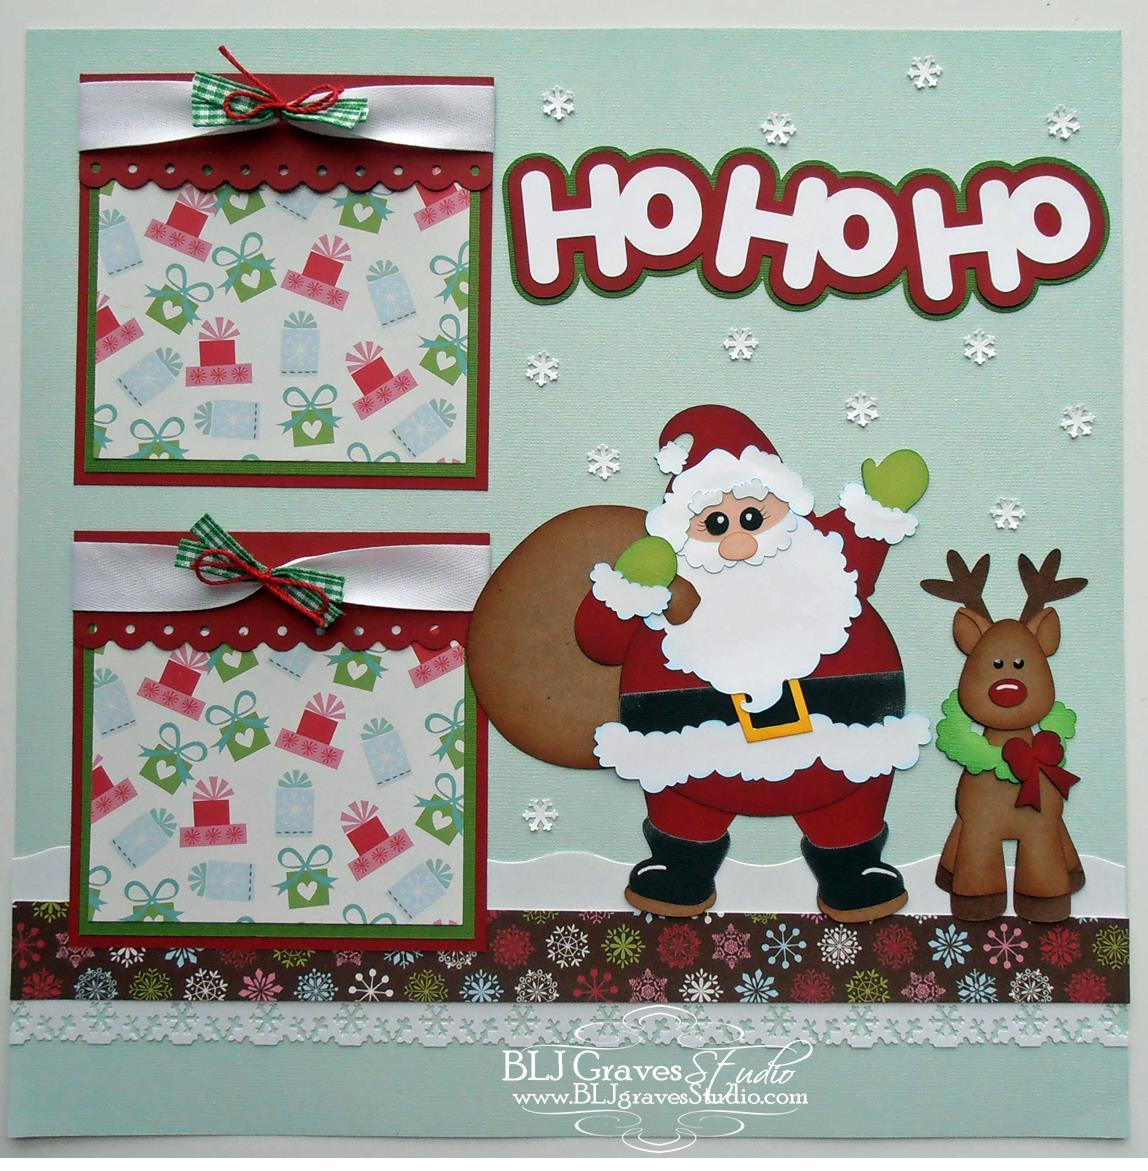 Blj graves studio christmas santa scrapbook page for Christmas layout ideas